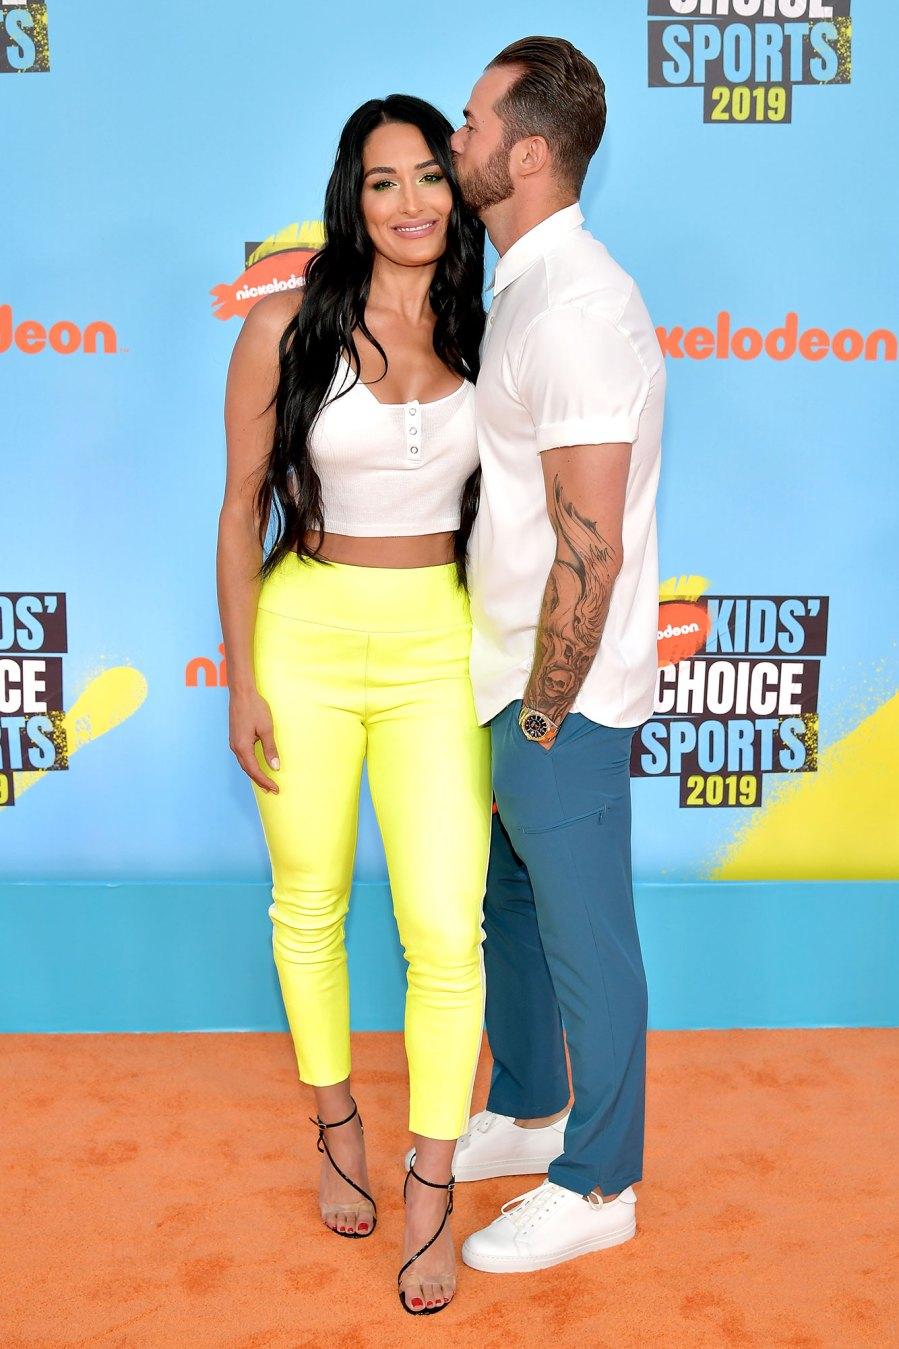 Nikki Bella and Artem Chigvintsev Red Orange Carpet Nickelodeon Kids' Choice Sports 2019